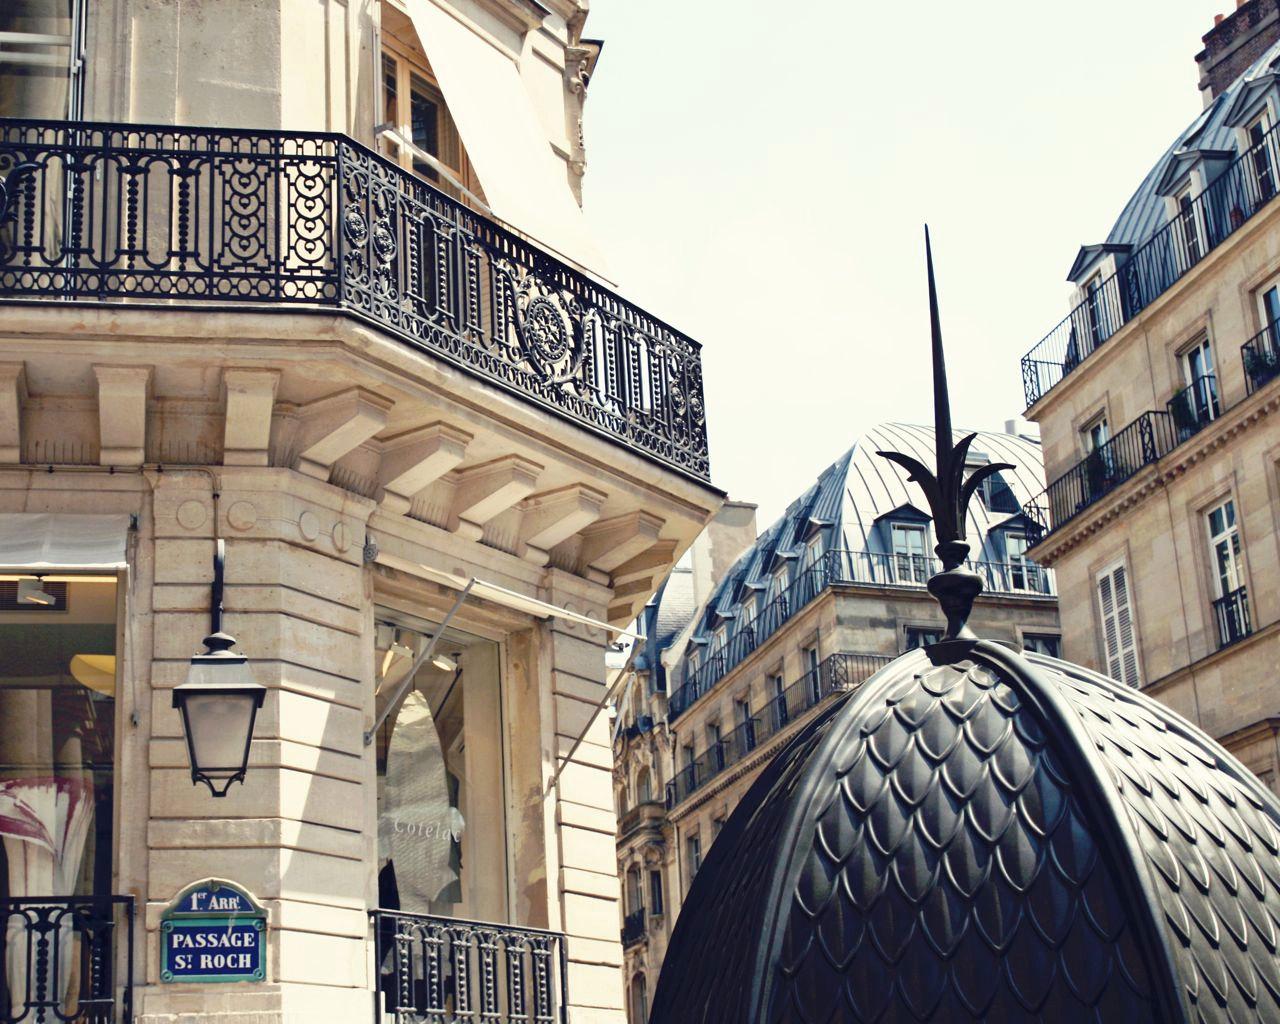 global architecture parisian chic la dolce vita. Black Bedroom Furniture Sets. Home Design Ideas